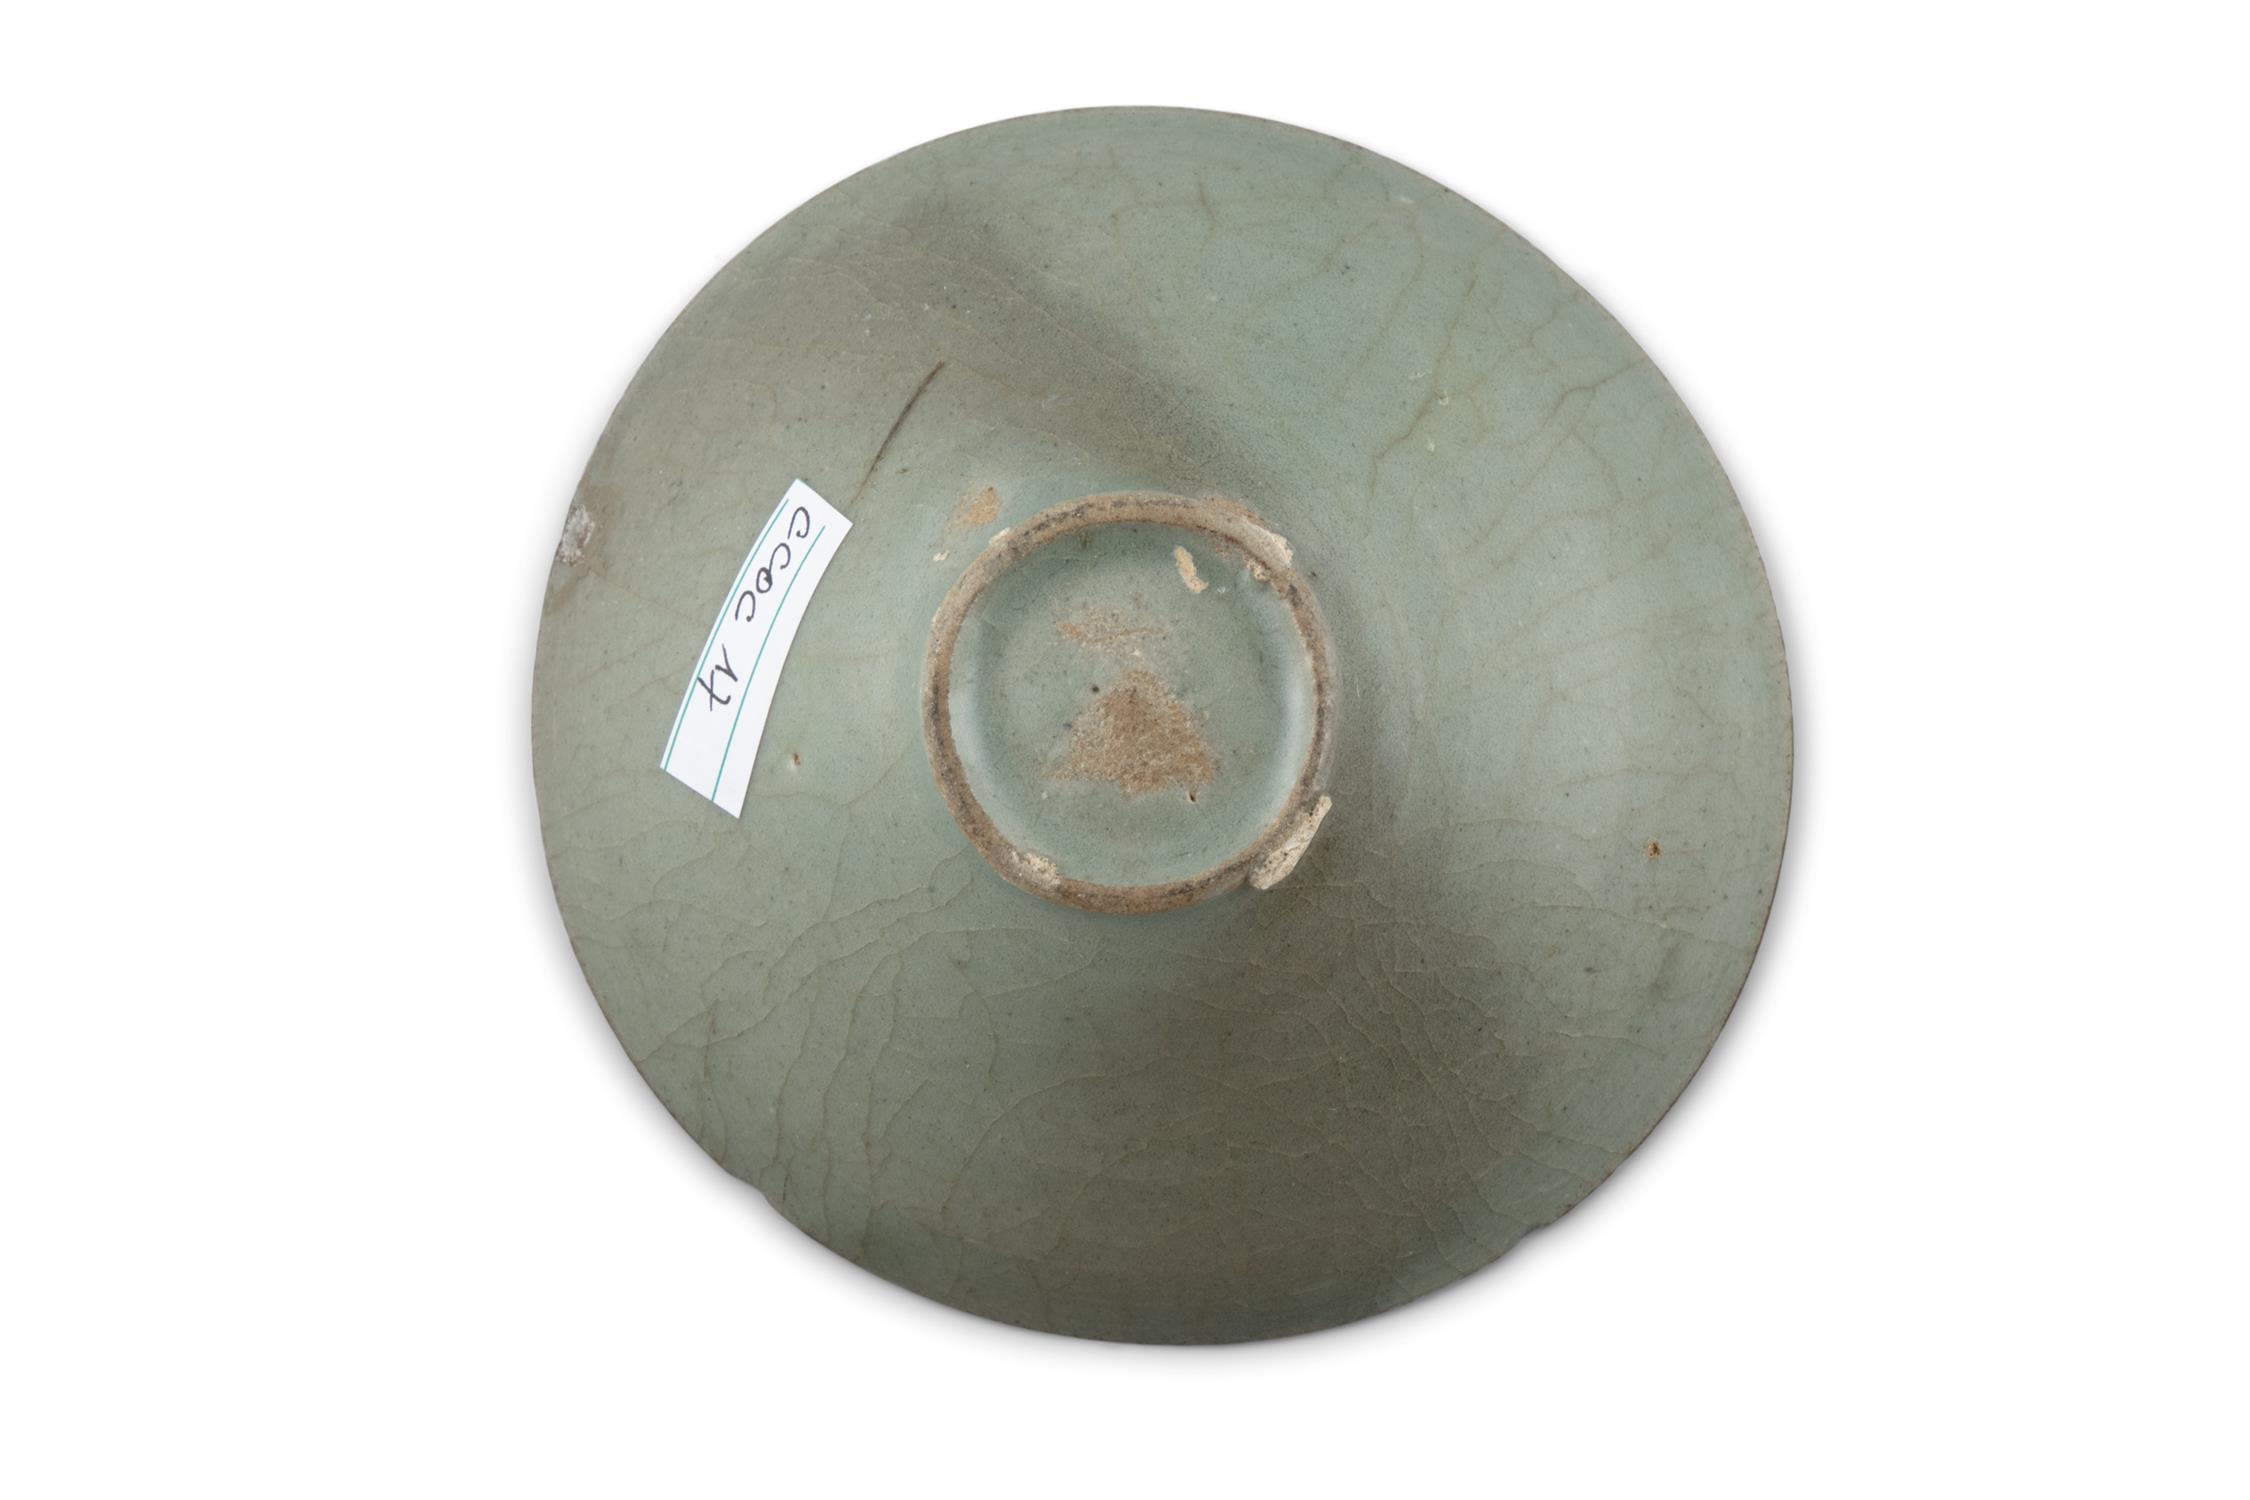 A CONICAL SHAPED CELADON GLAZED STONEWARE BOWL Korea, Joseon Dynasty H: 5cm - D: 13.3cm - Image 7 of 8